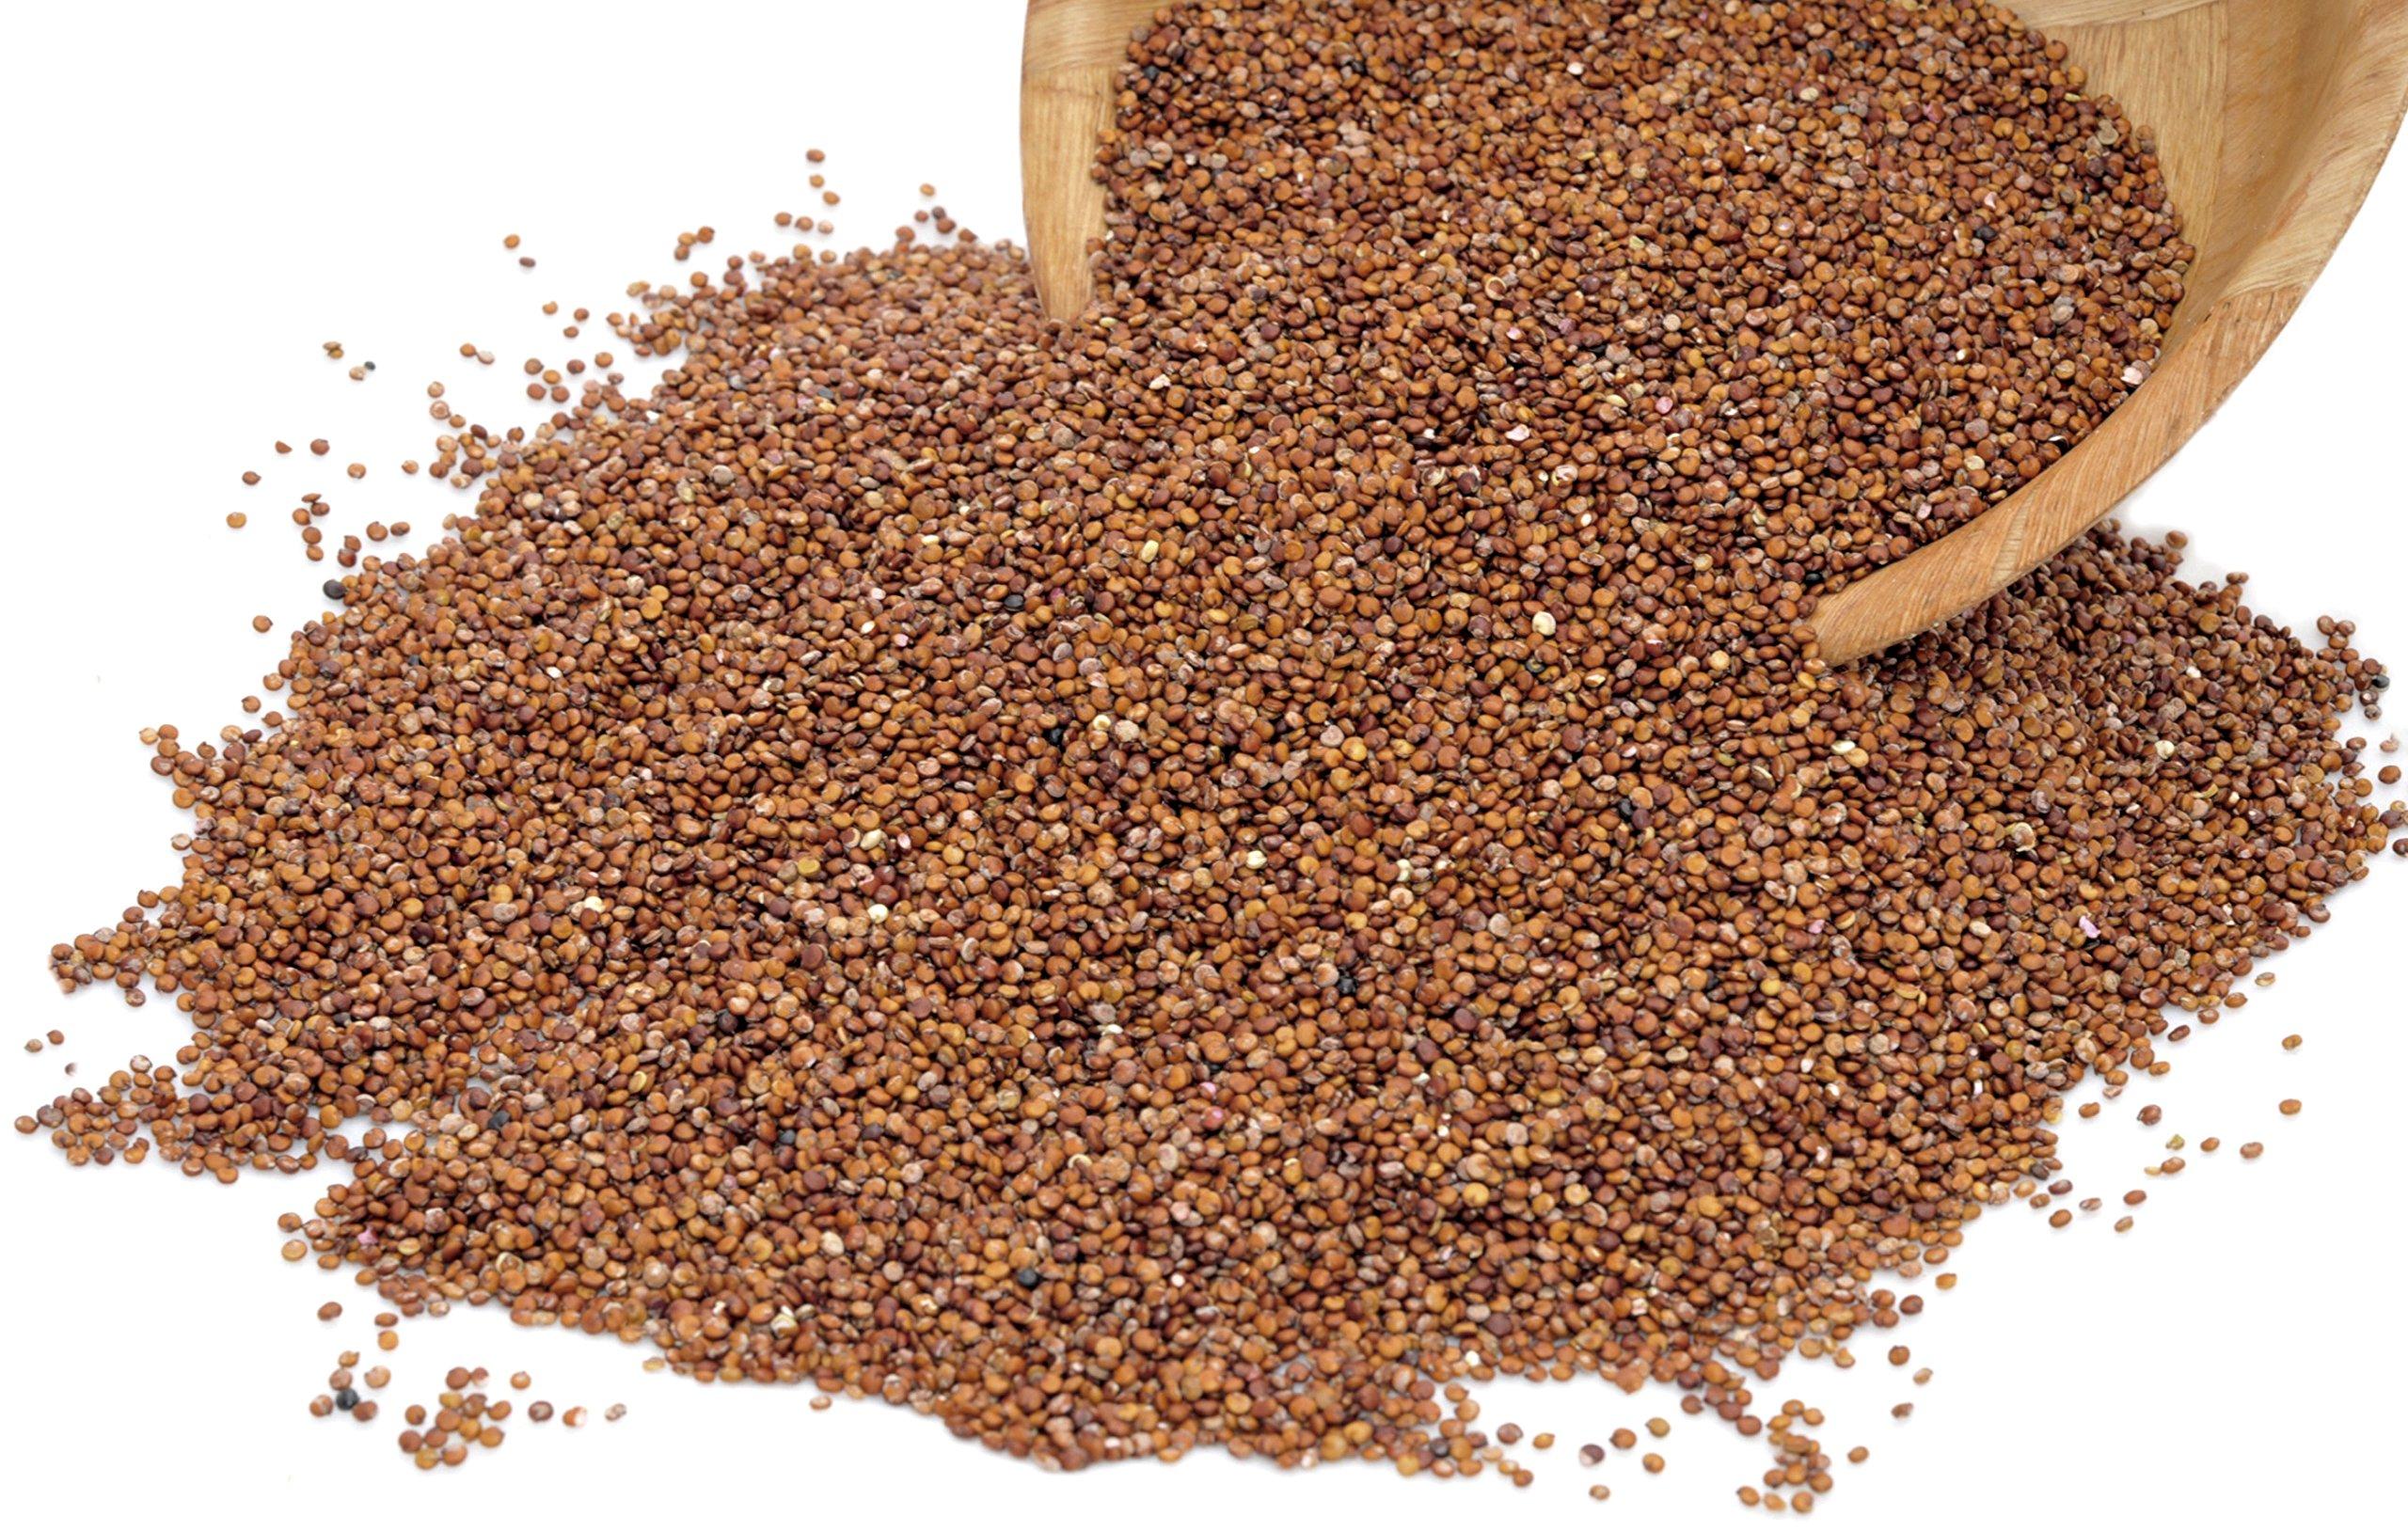 Royal Organic Red OA Quinoa (25 Lb bag) by OA QUINOA (Image #3)